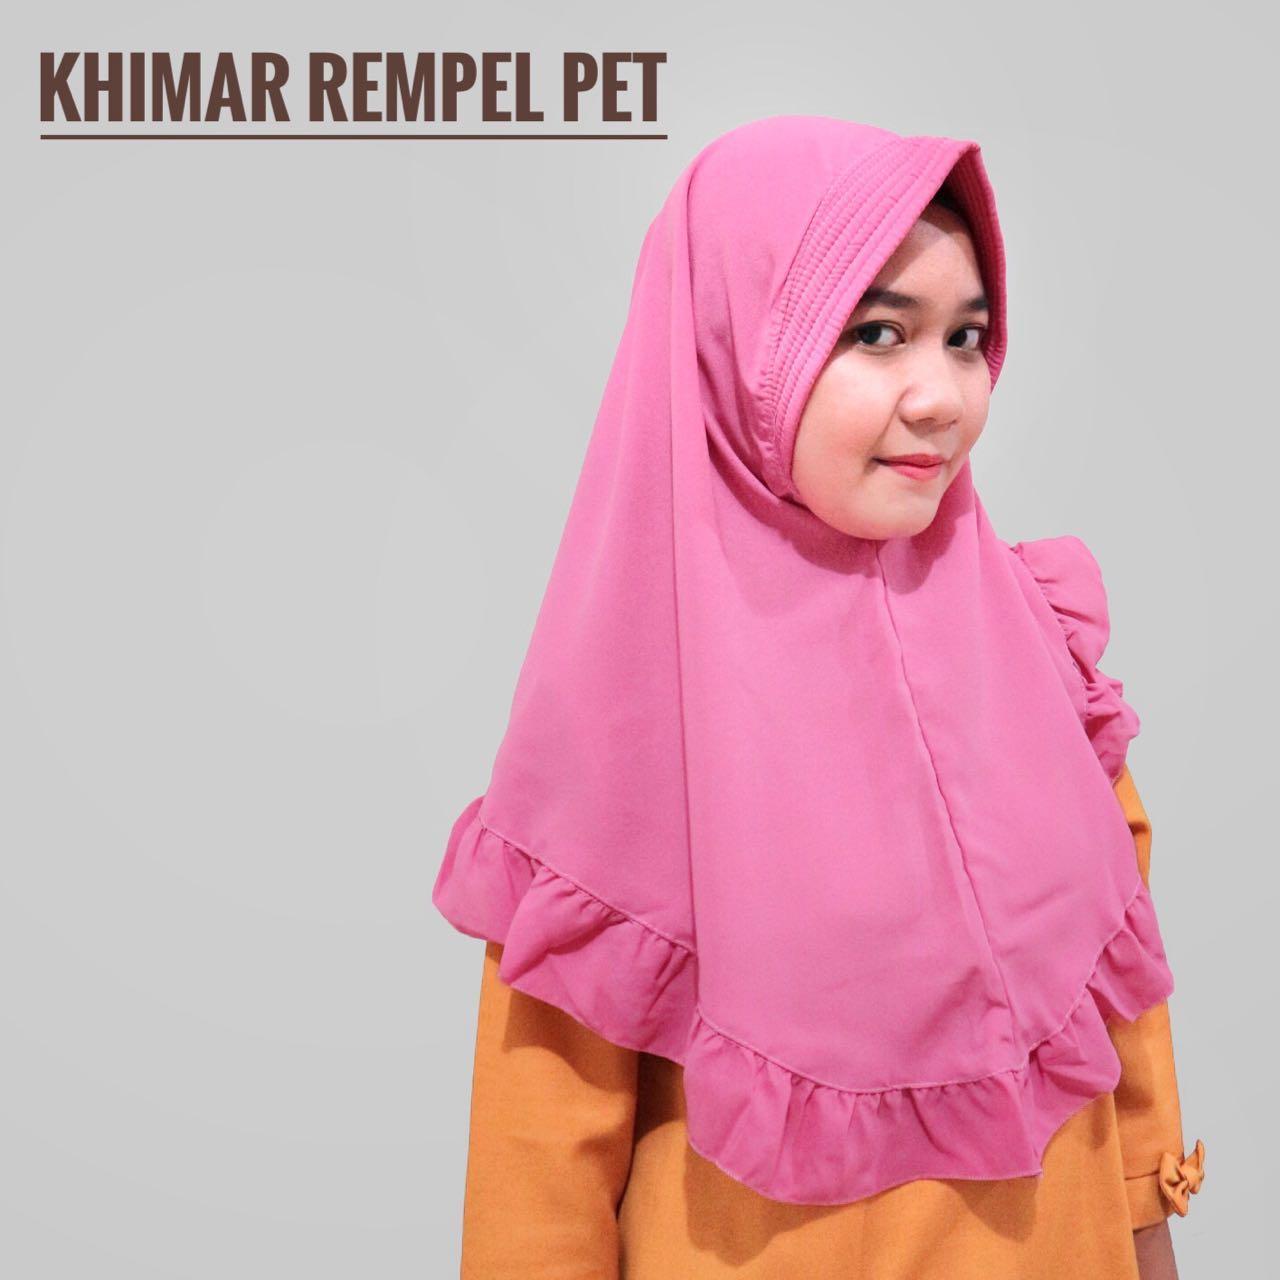 Rempel Pet Khimar  jilbab wolfis  kerudung rempel